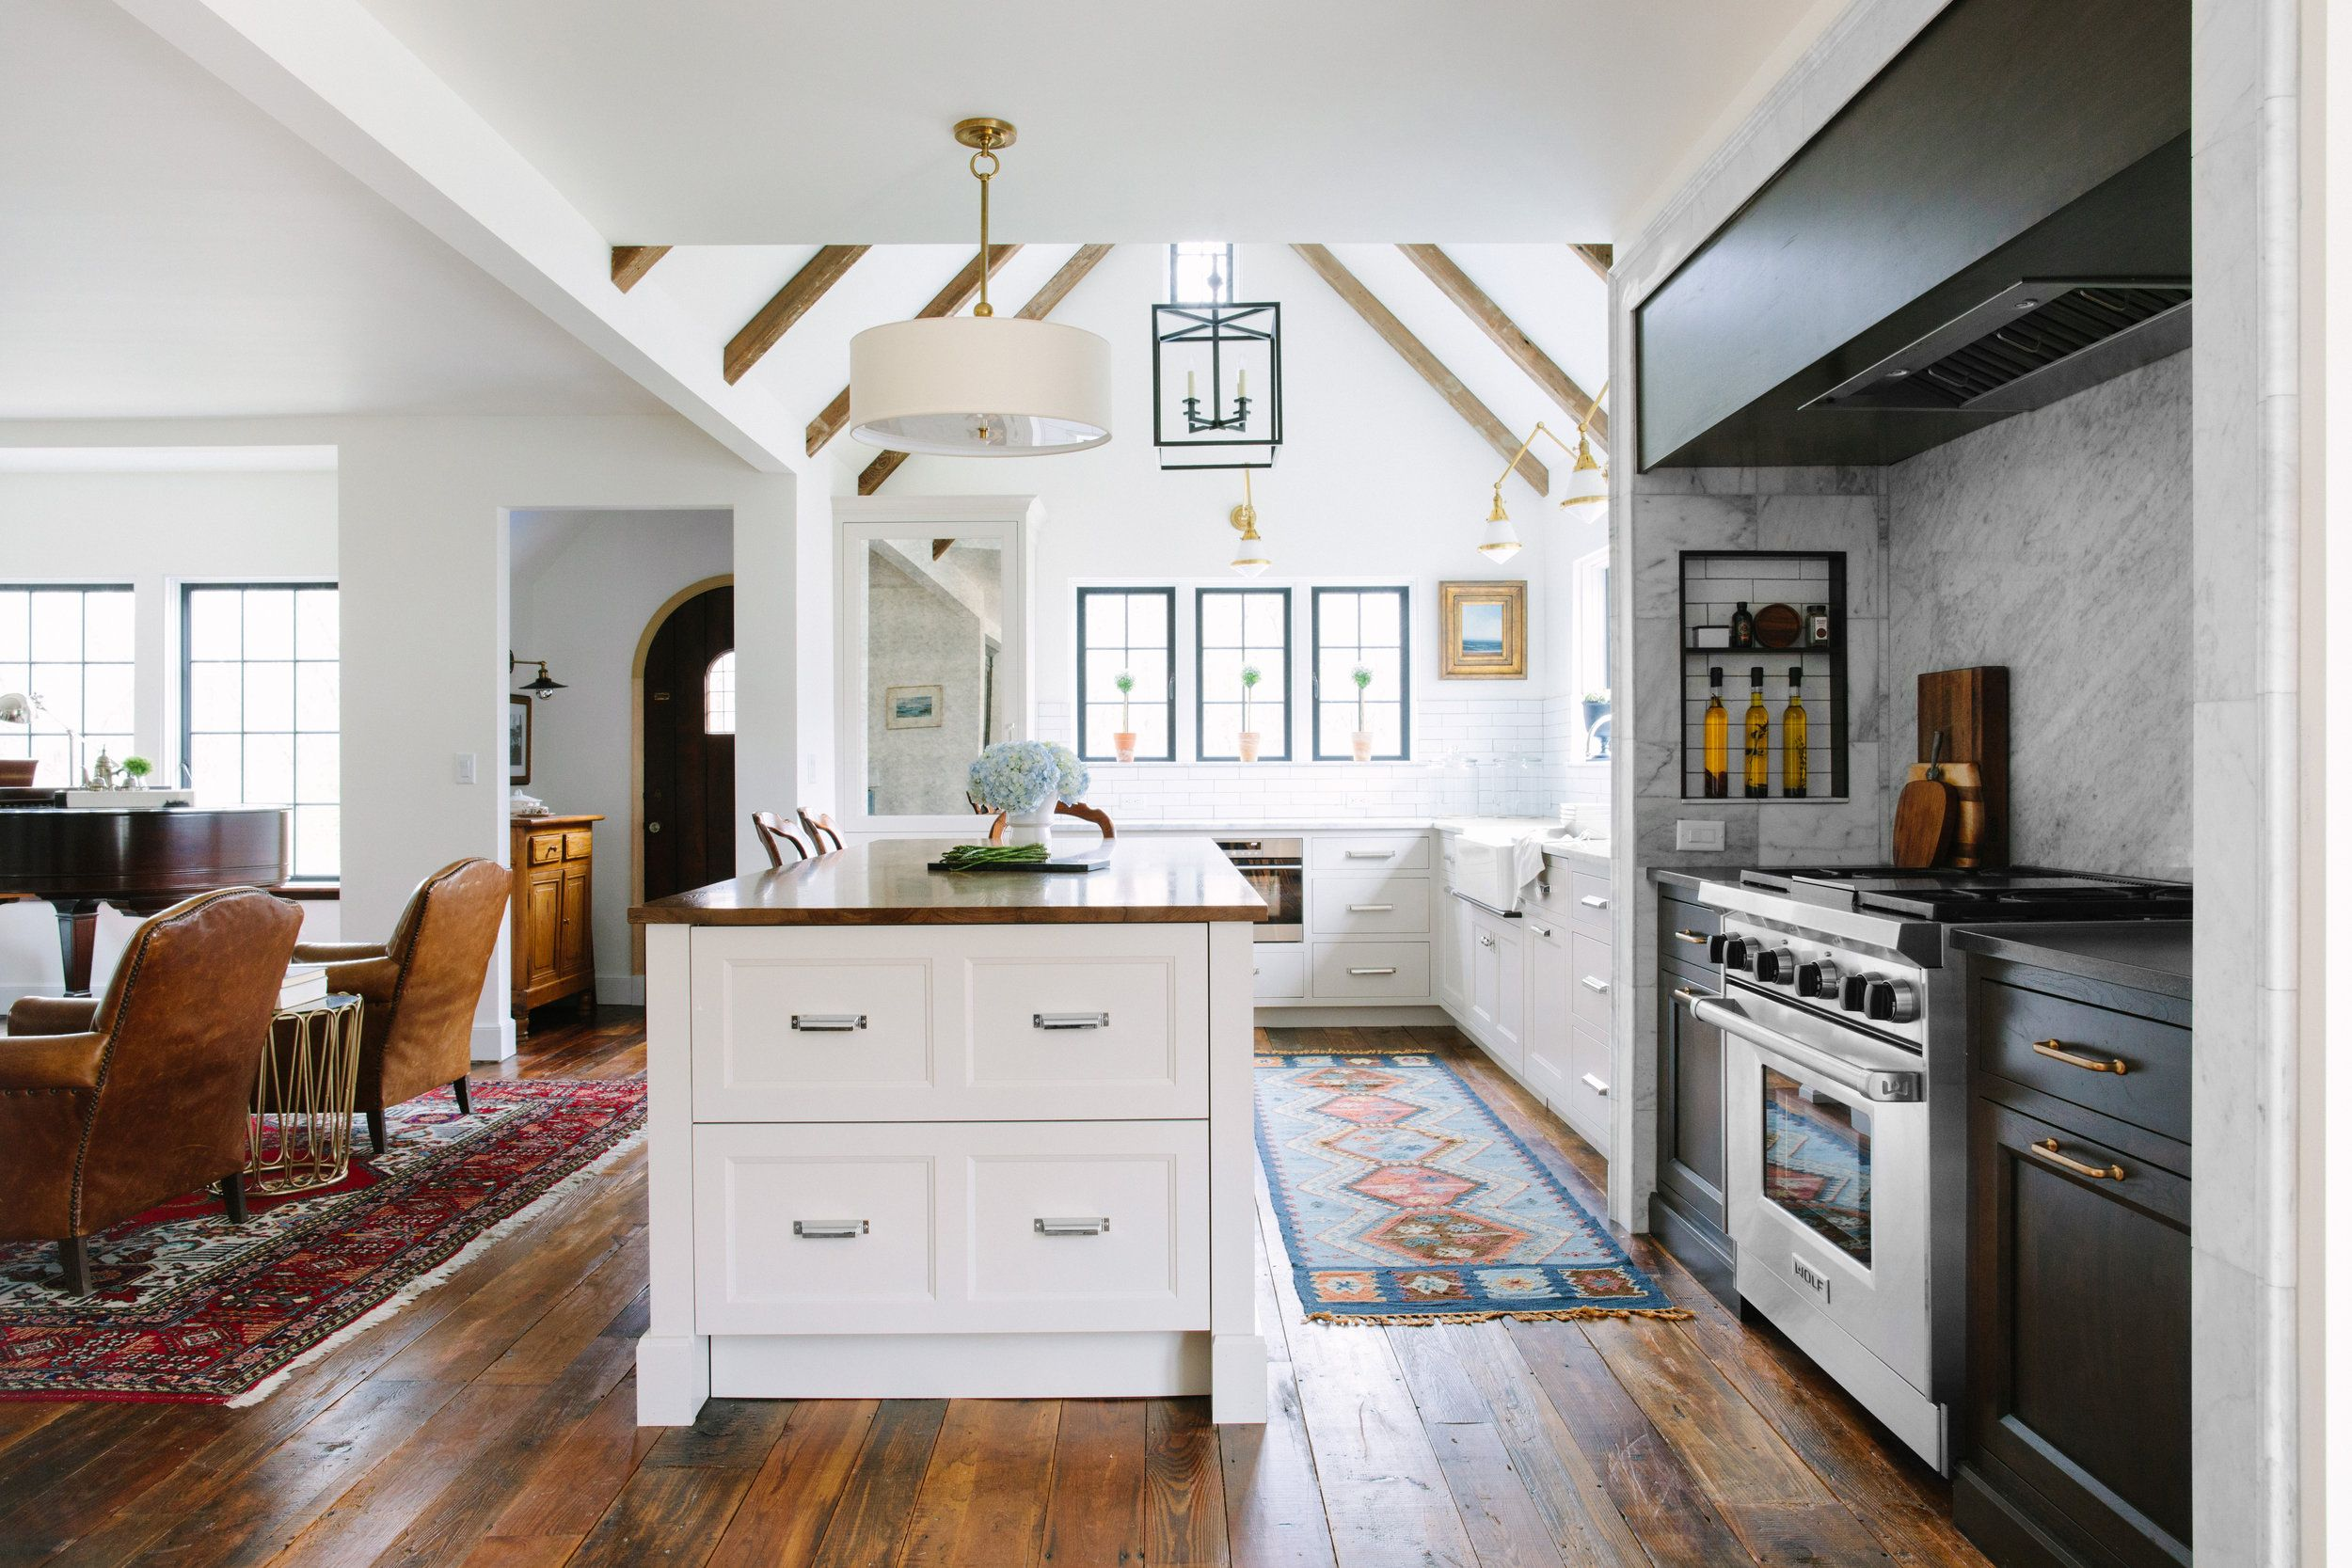 English Cottage Kitchen Designs English Cottage Kitchen Pictures ...